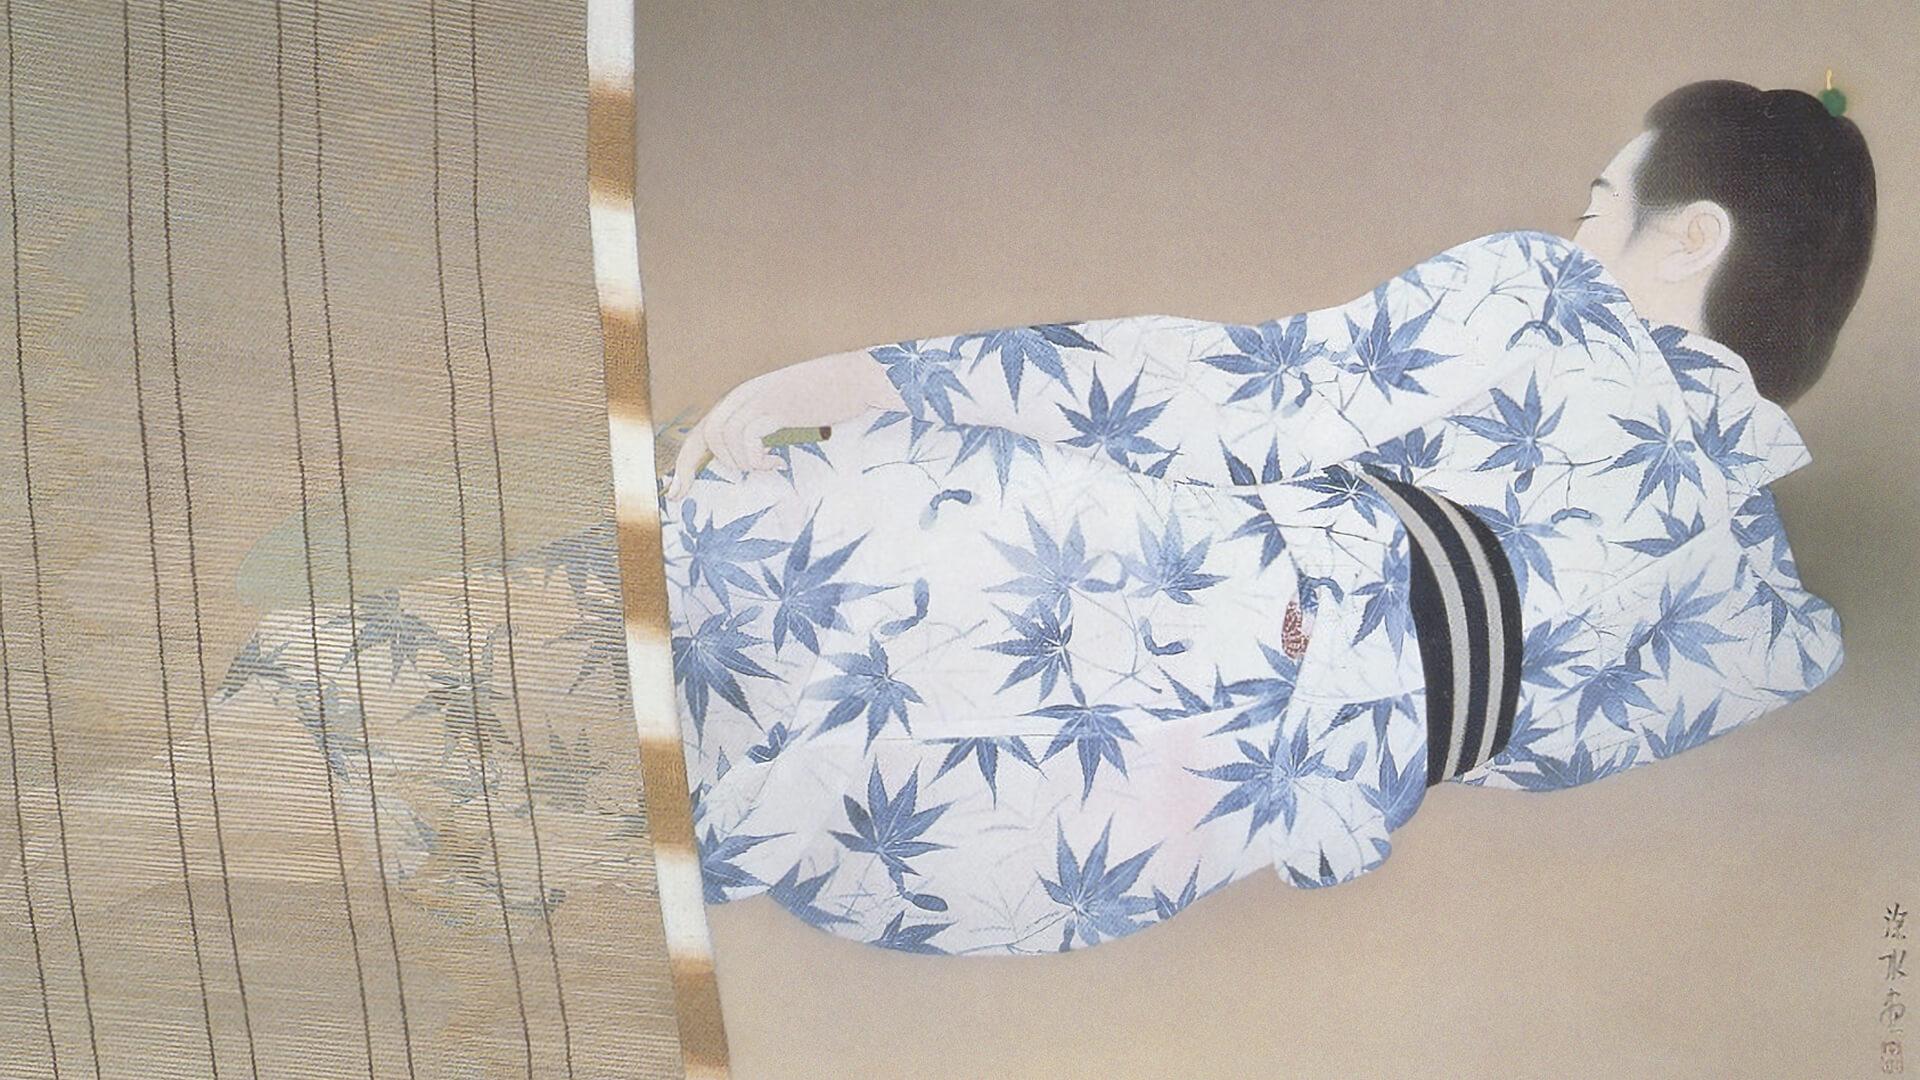 ito shinsui-yoi_1920x1080